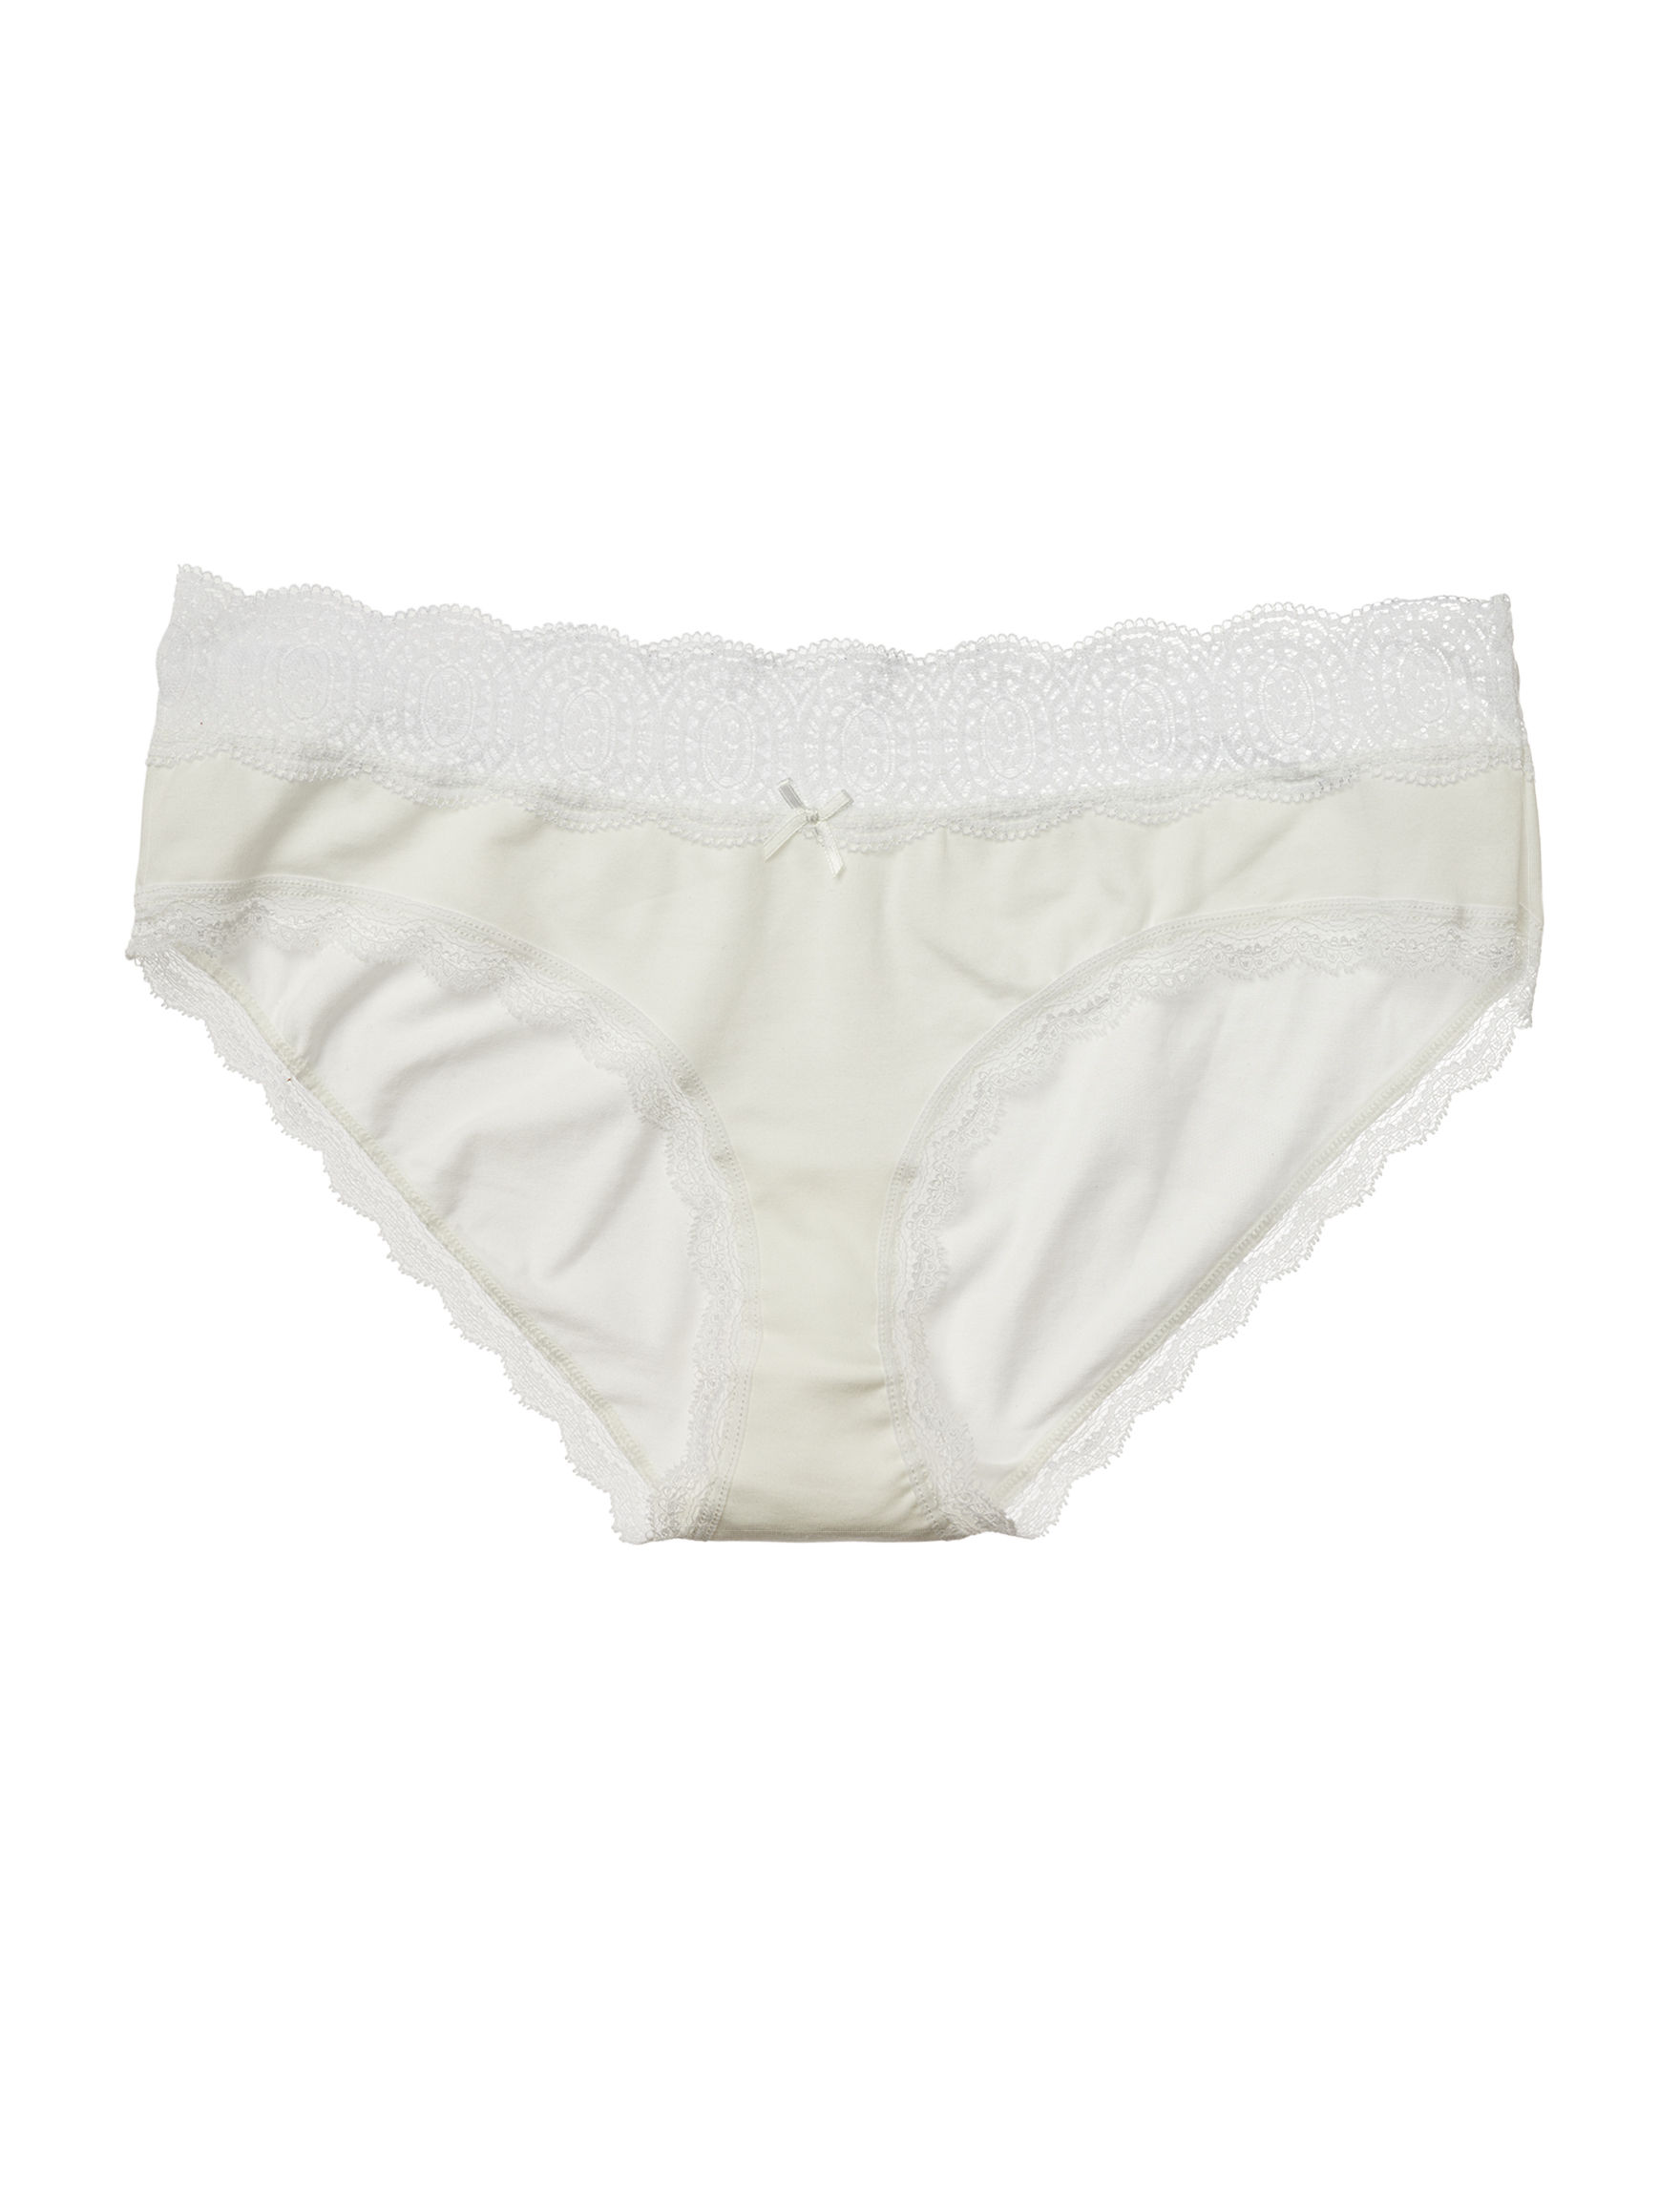 International Intimates White Panties Hipster